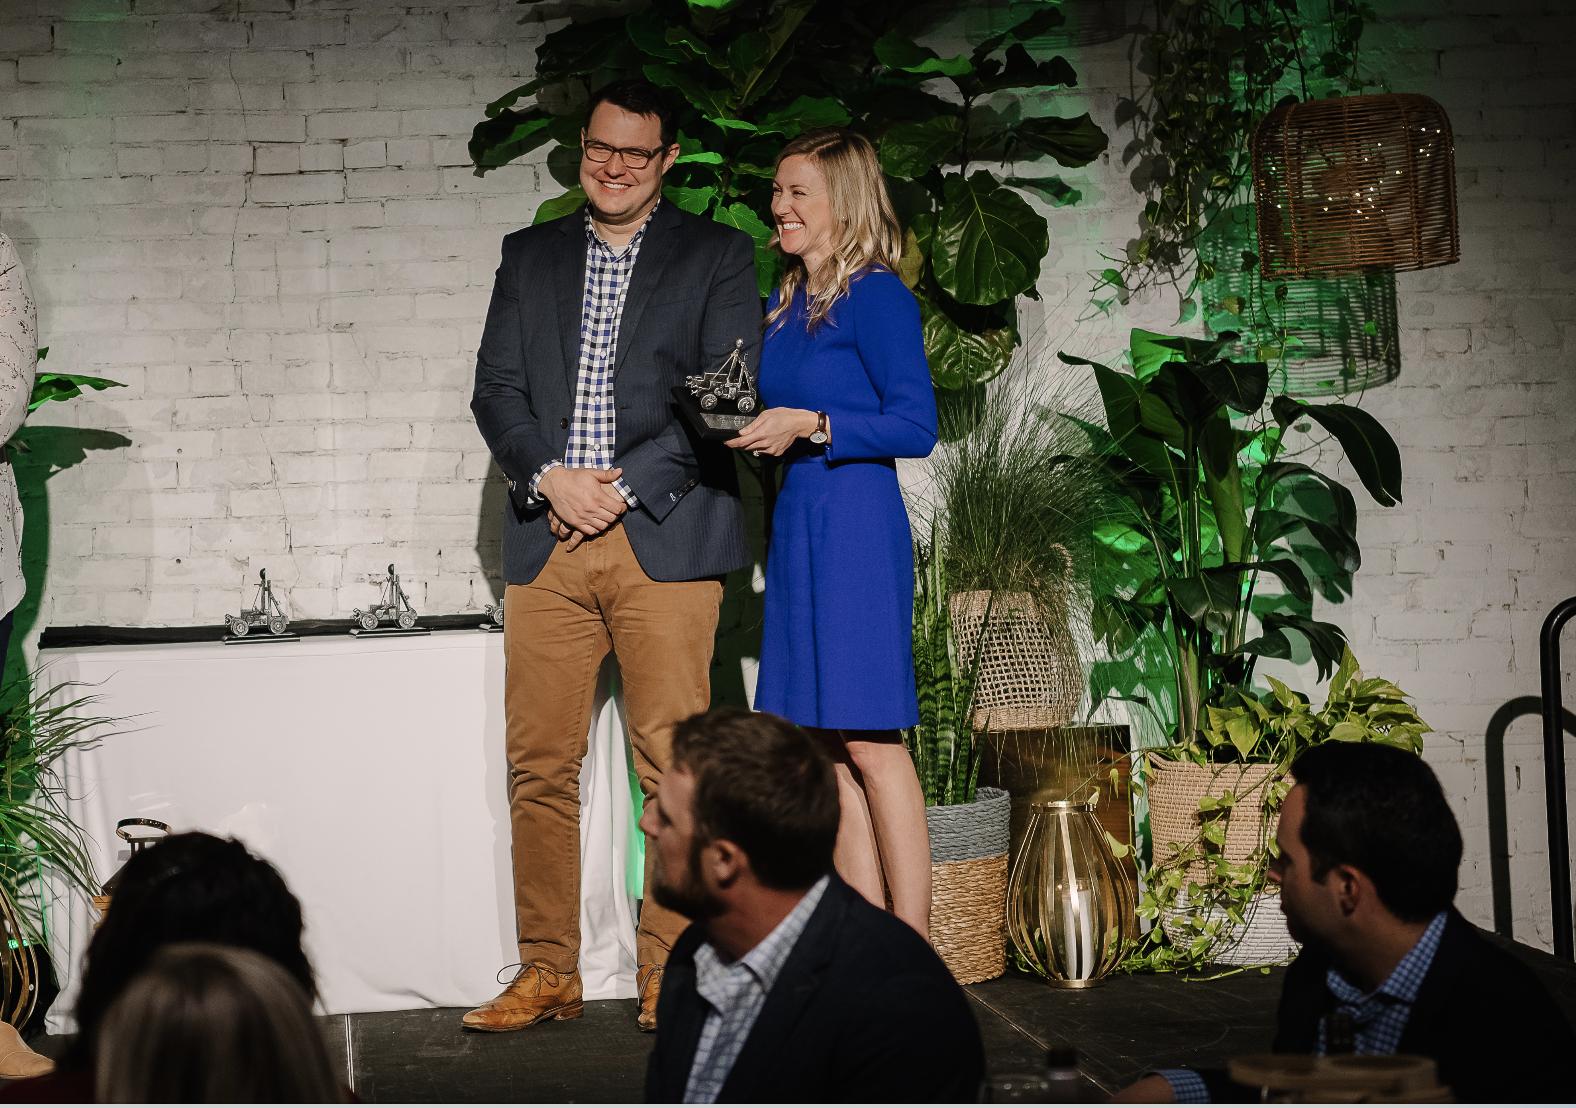 Lakeland Entrepreneur Awards Recipient